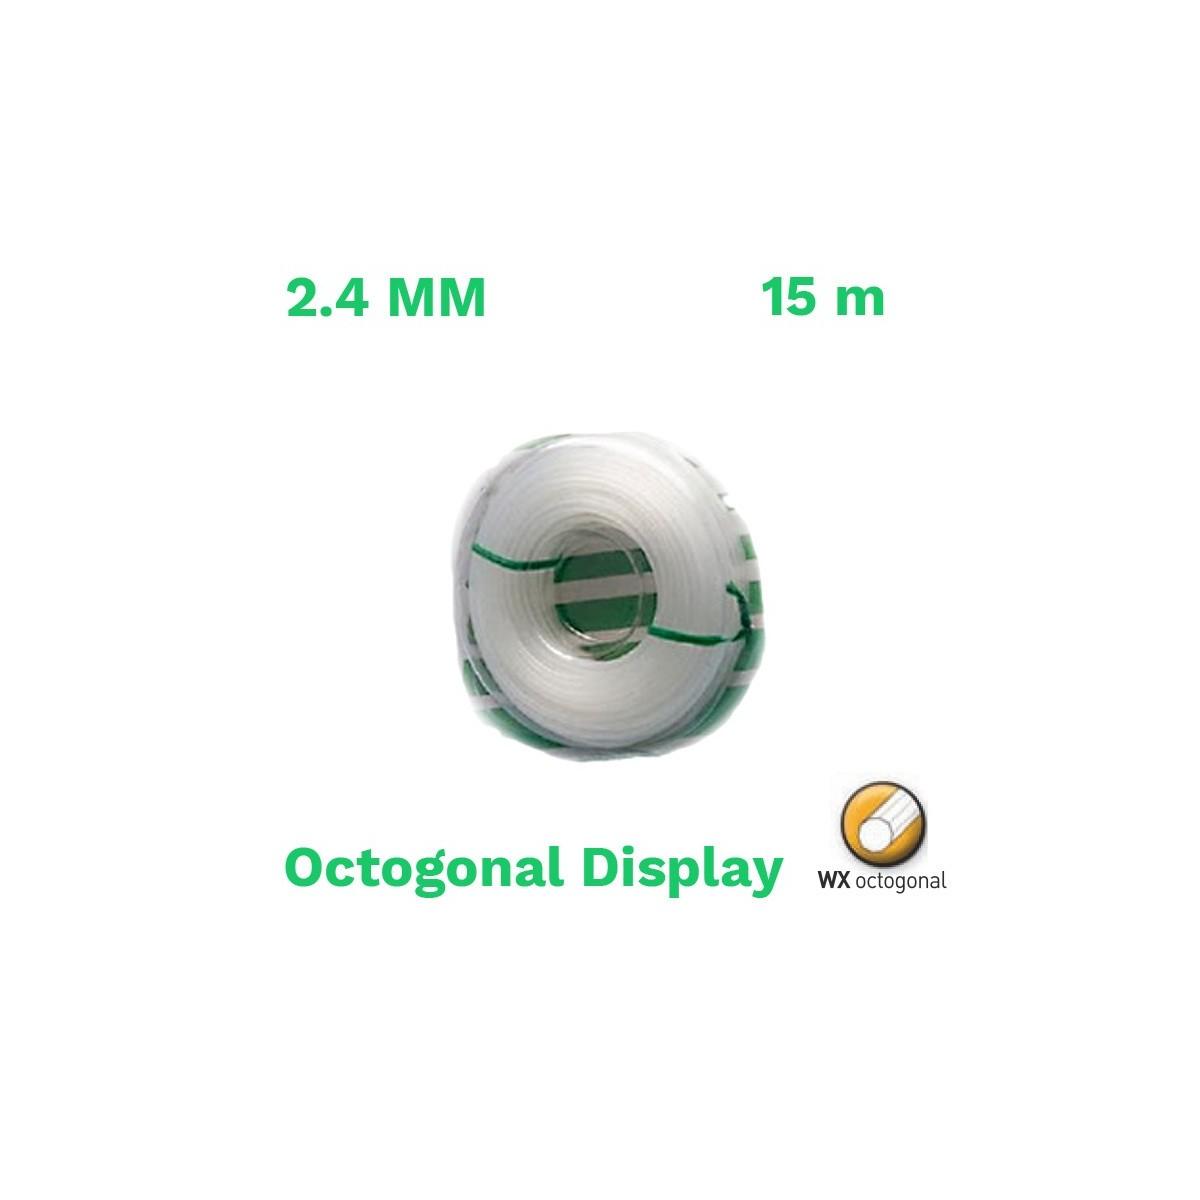 Echo hilo nylon octogonal display 2